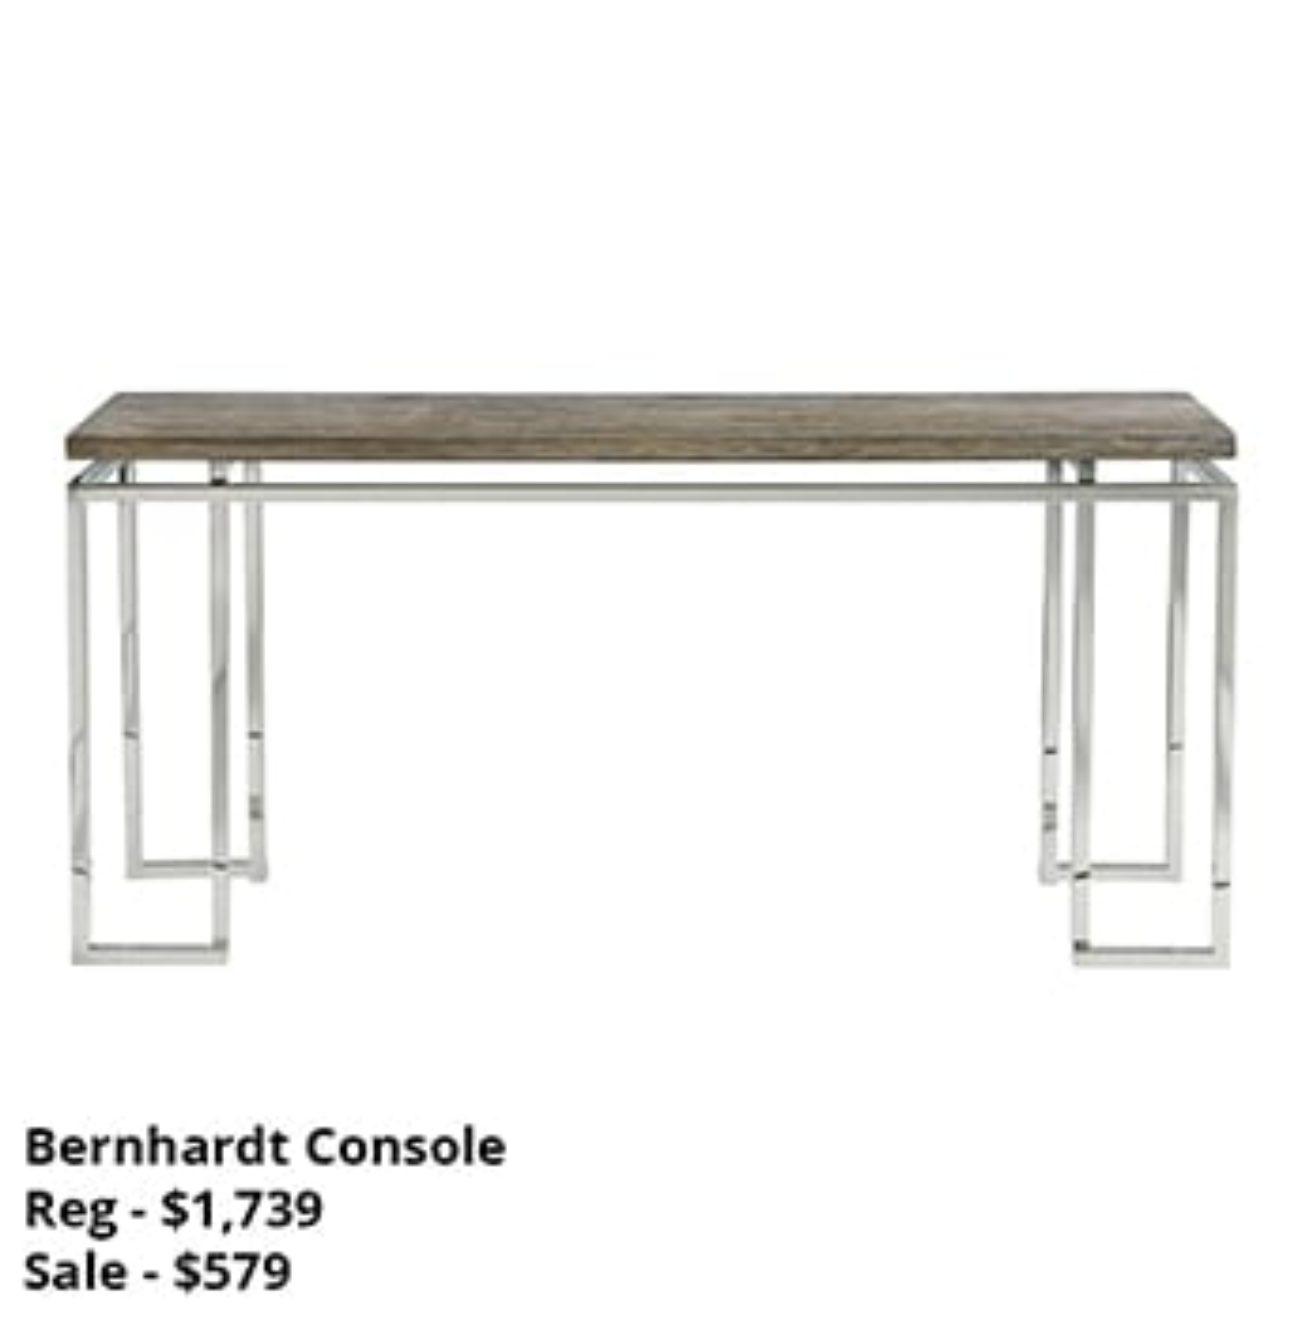 Bernhardt Console